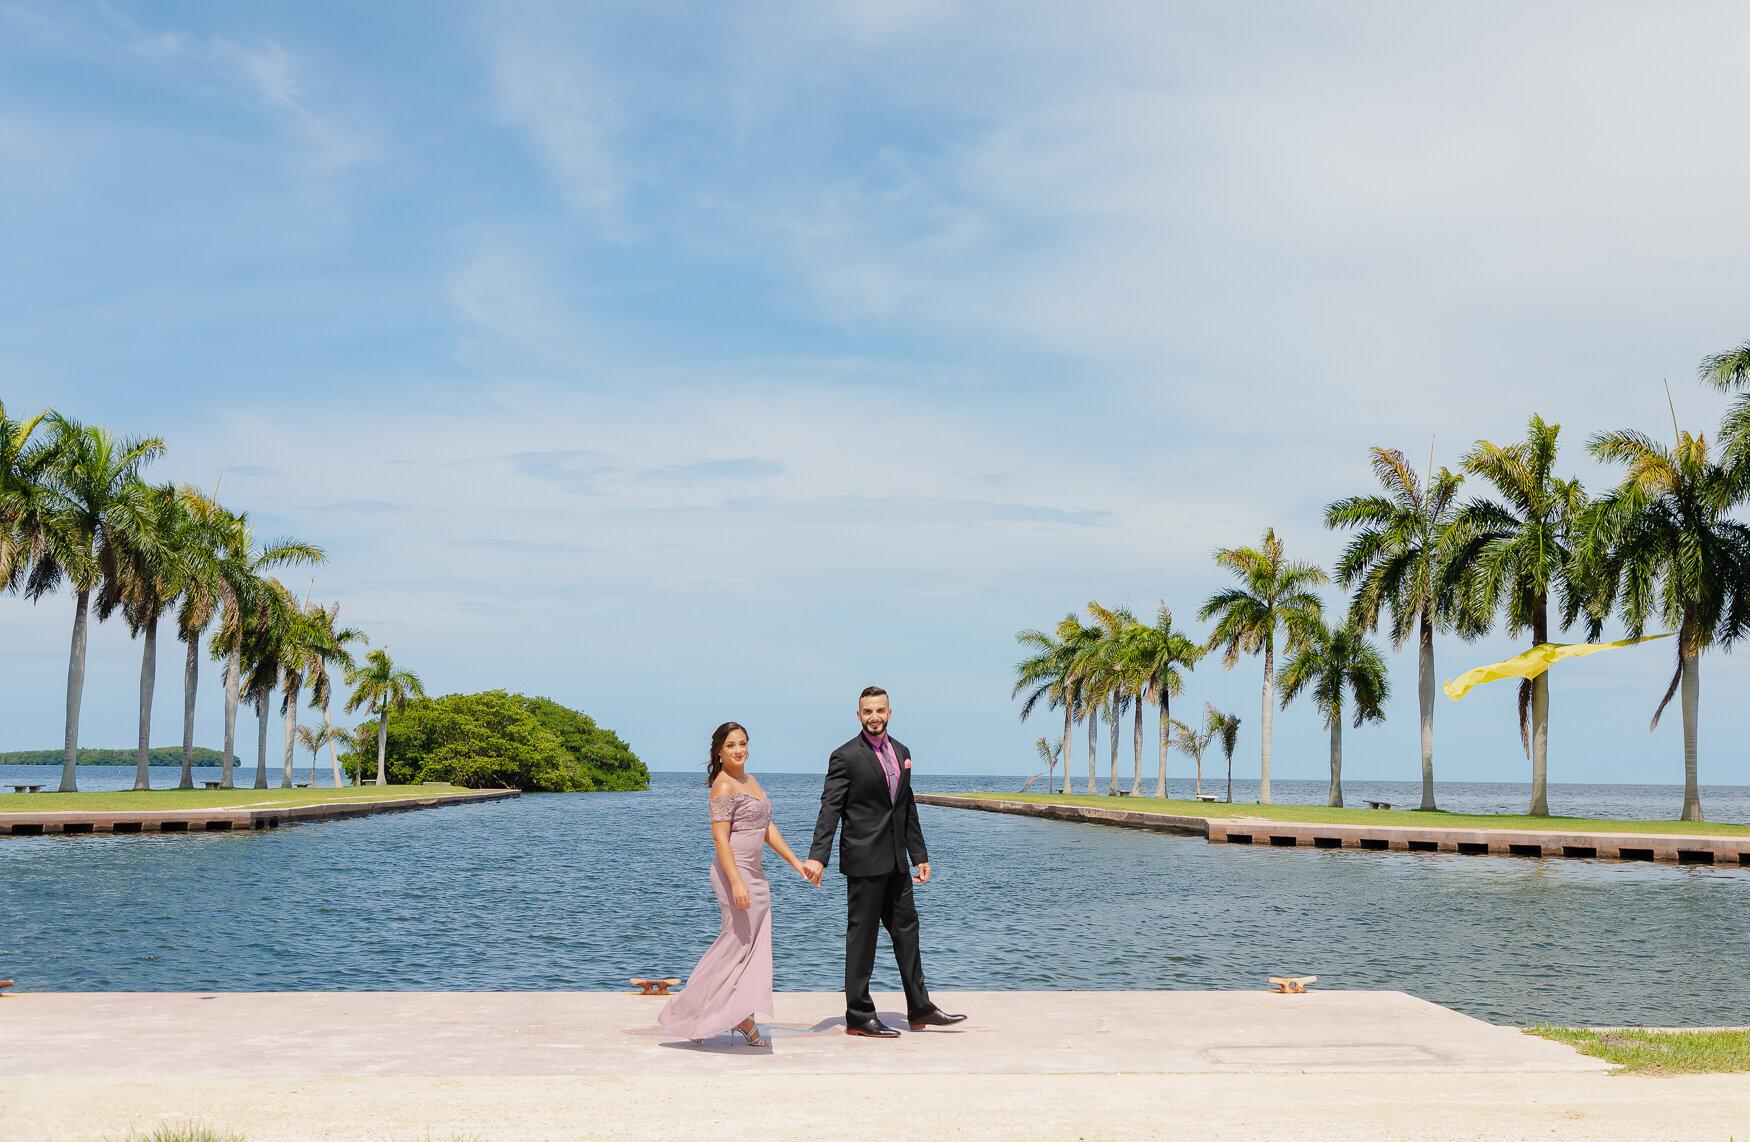 Deering Estate Engagement Photos - Miami Engagement Photographer Dipp Photography